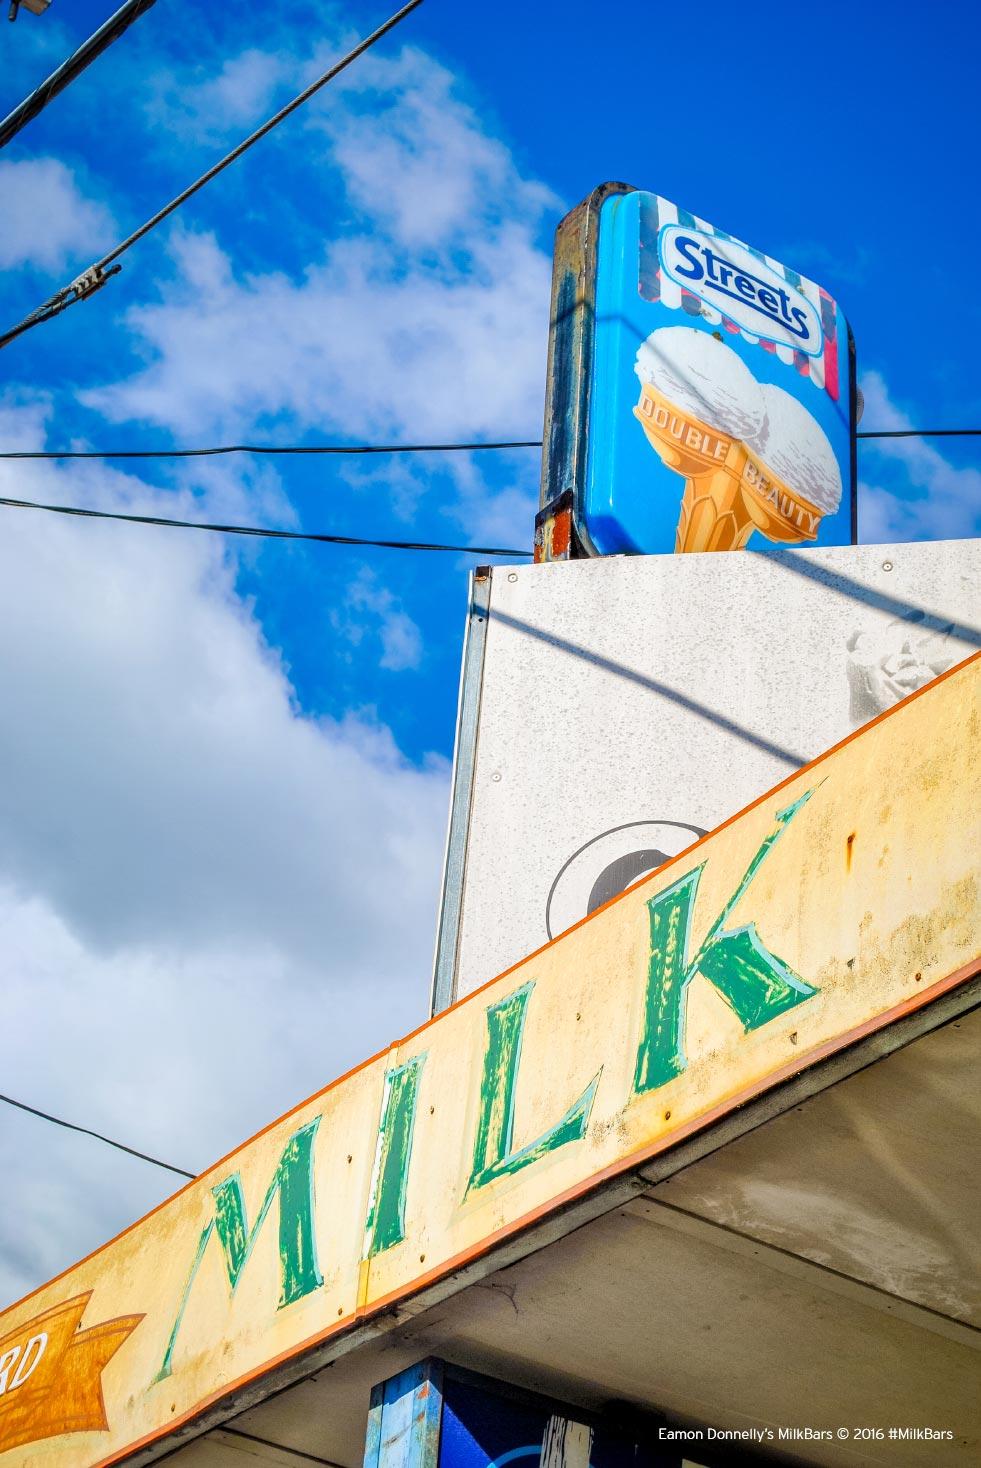 Ivanhoe-Streets-Ice-Cream-Milk-Bar-Eamon-Donnelly's-Milk-Bars-Book-Project-(c)-2001-2016.jpg